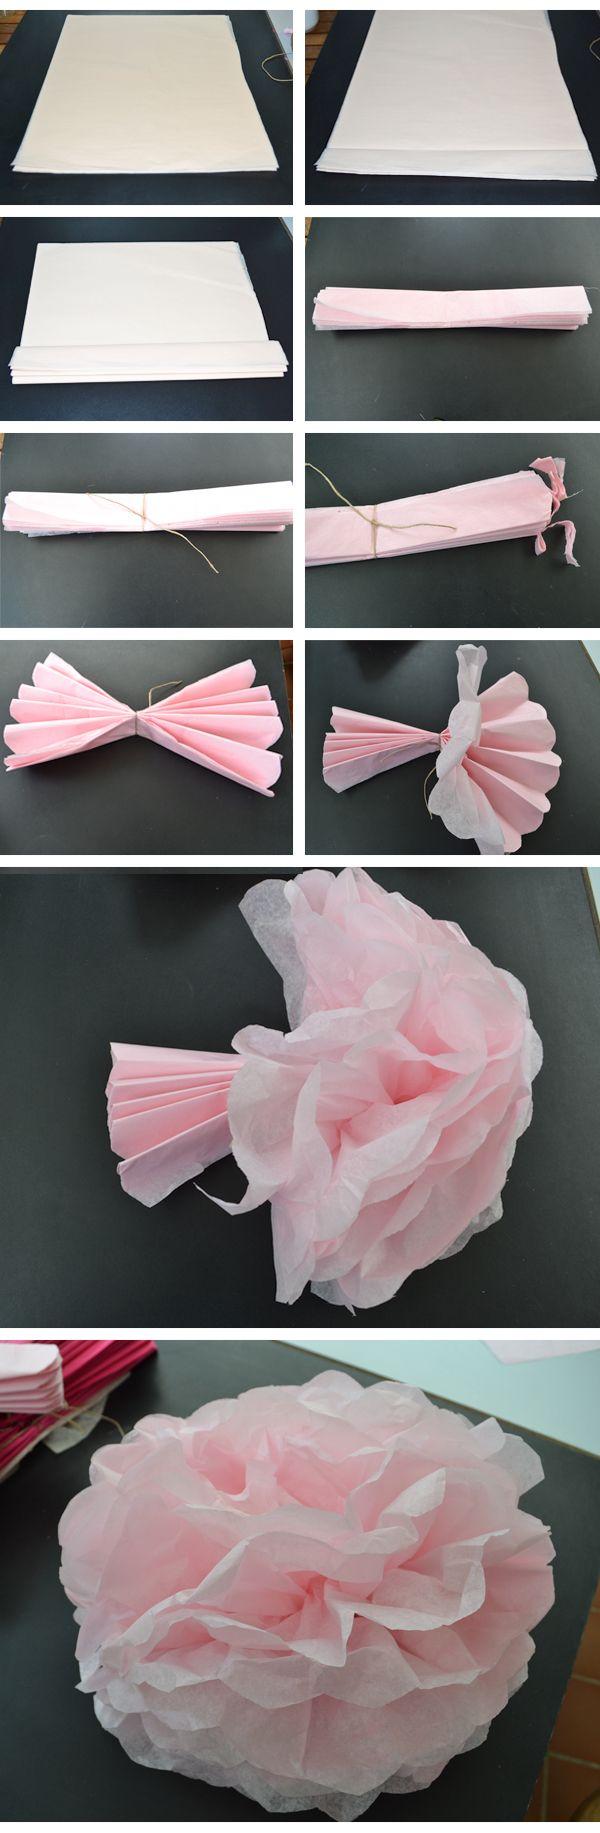 DIY : Pompons de soie | DIY Mariage | Queen For A Day - Blog mariage